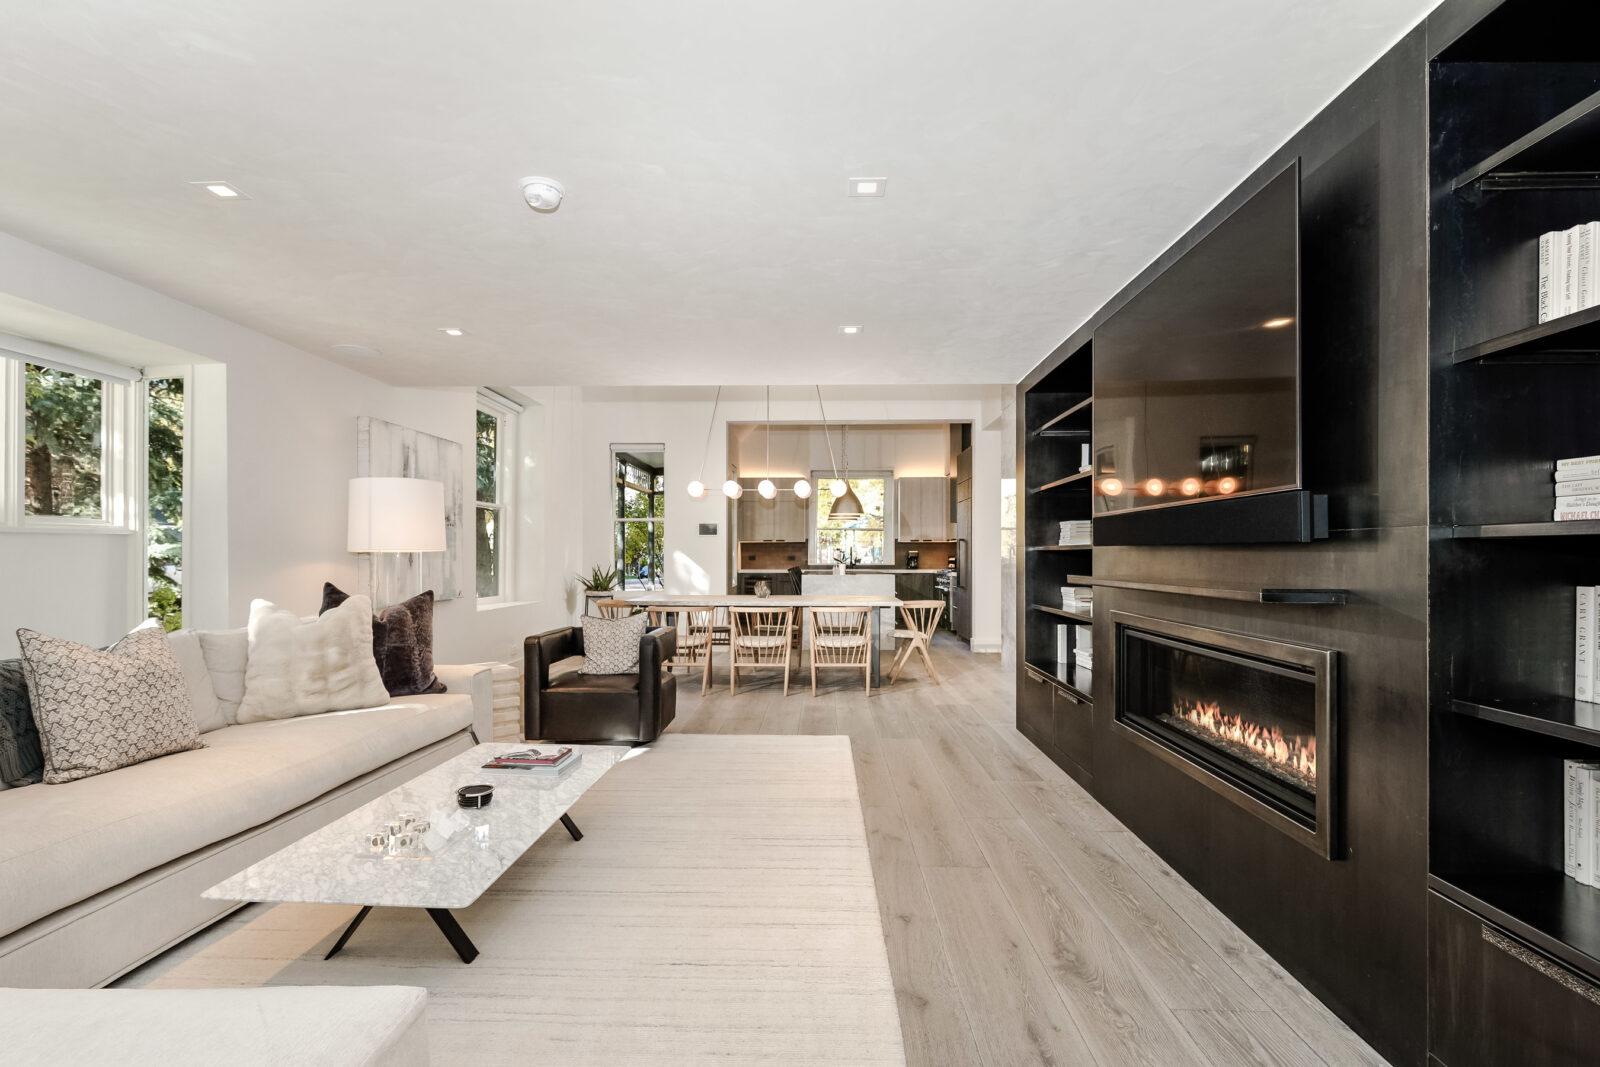 Interior living room at 131 W Bleeker in Aspen